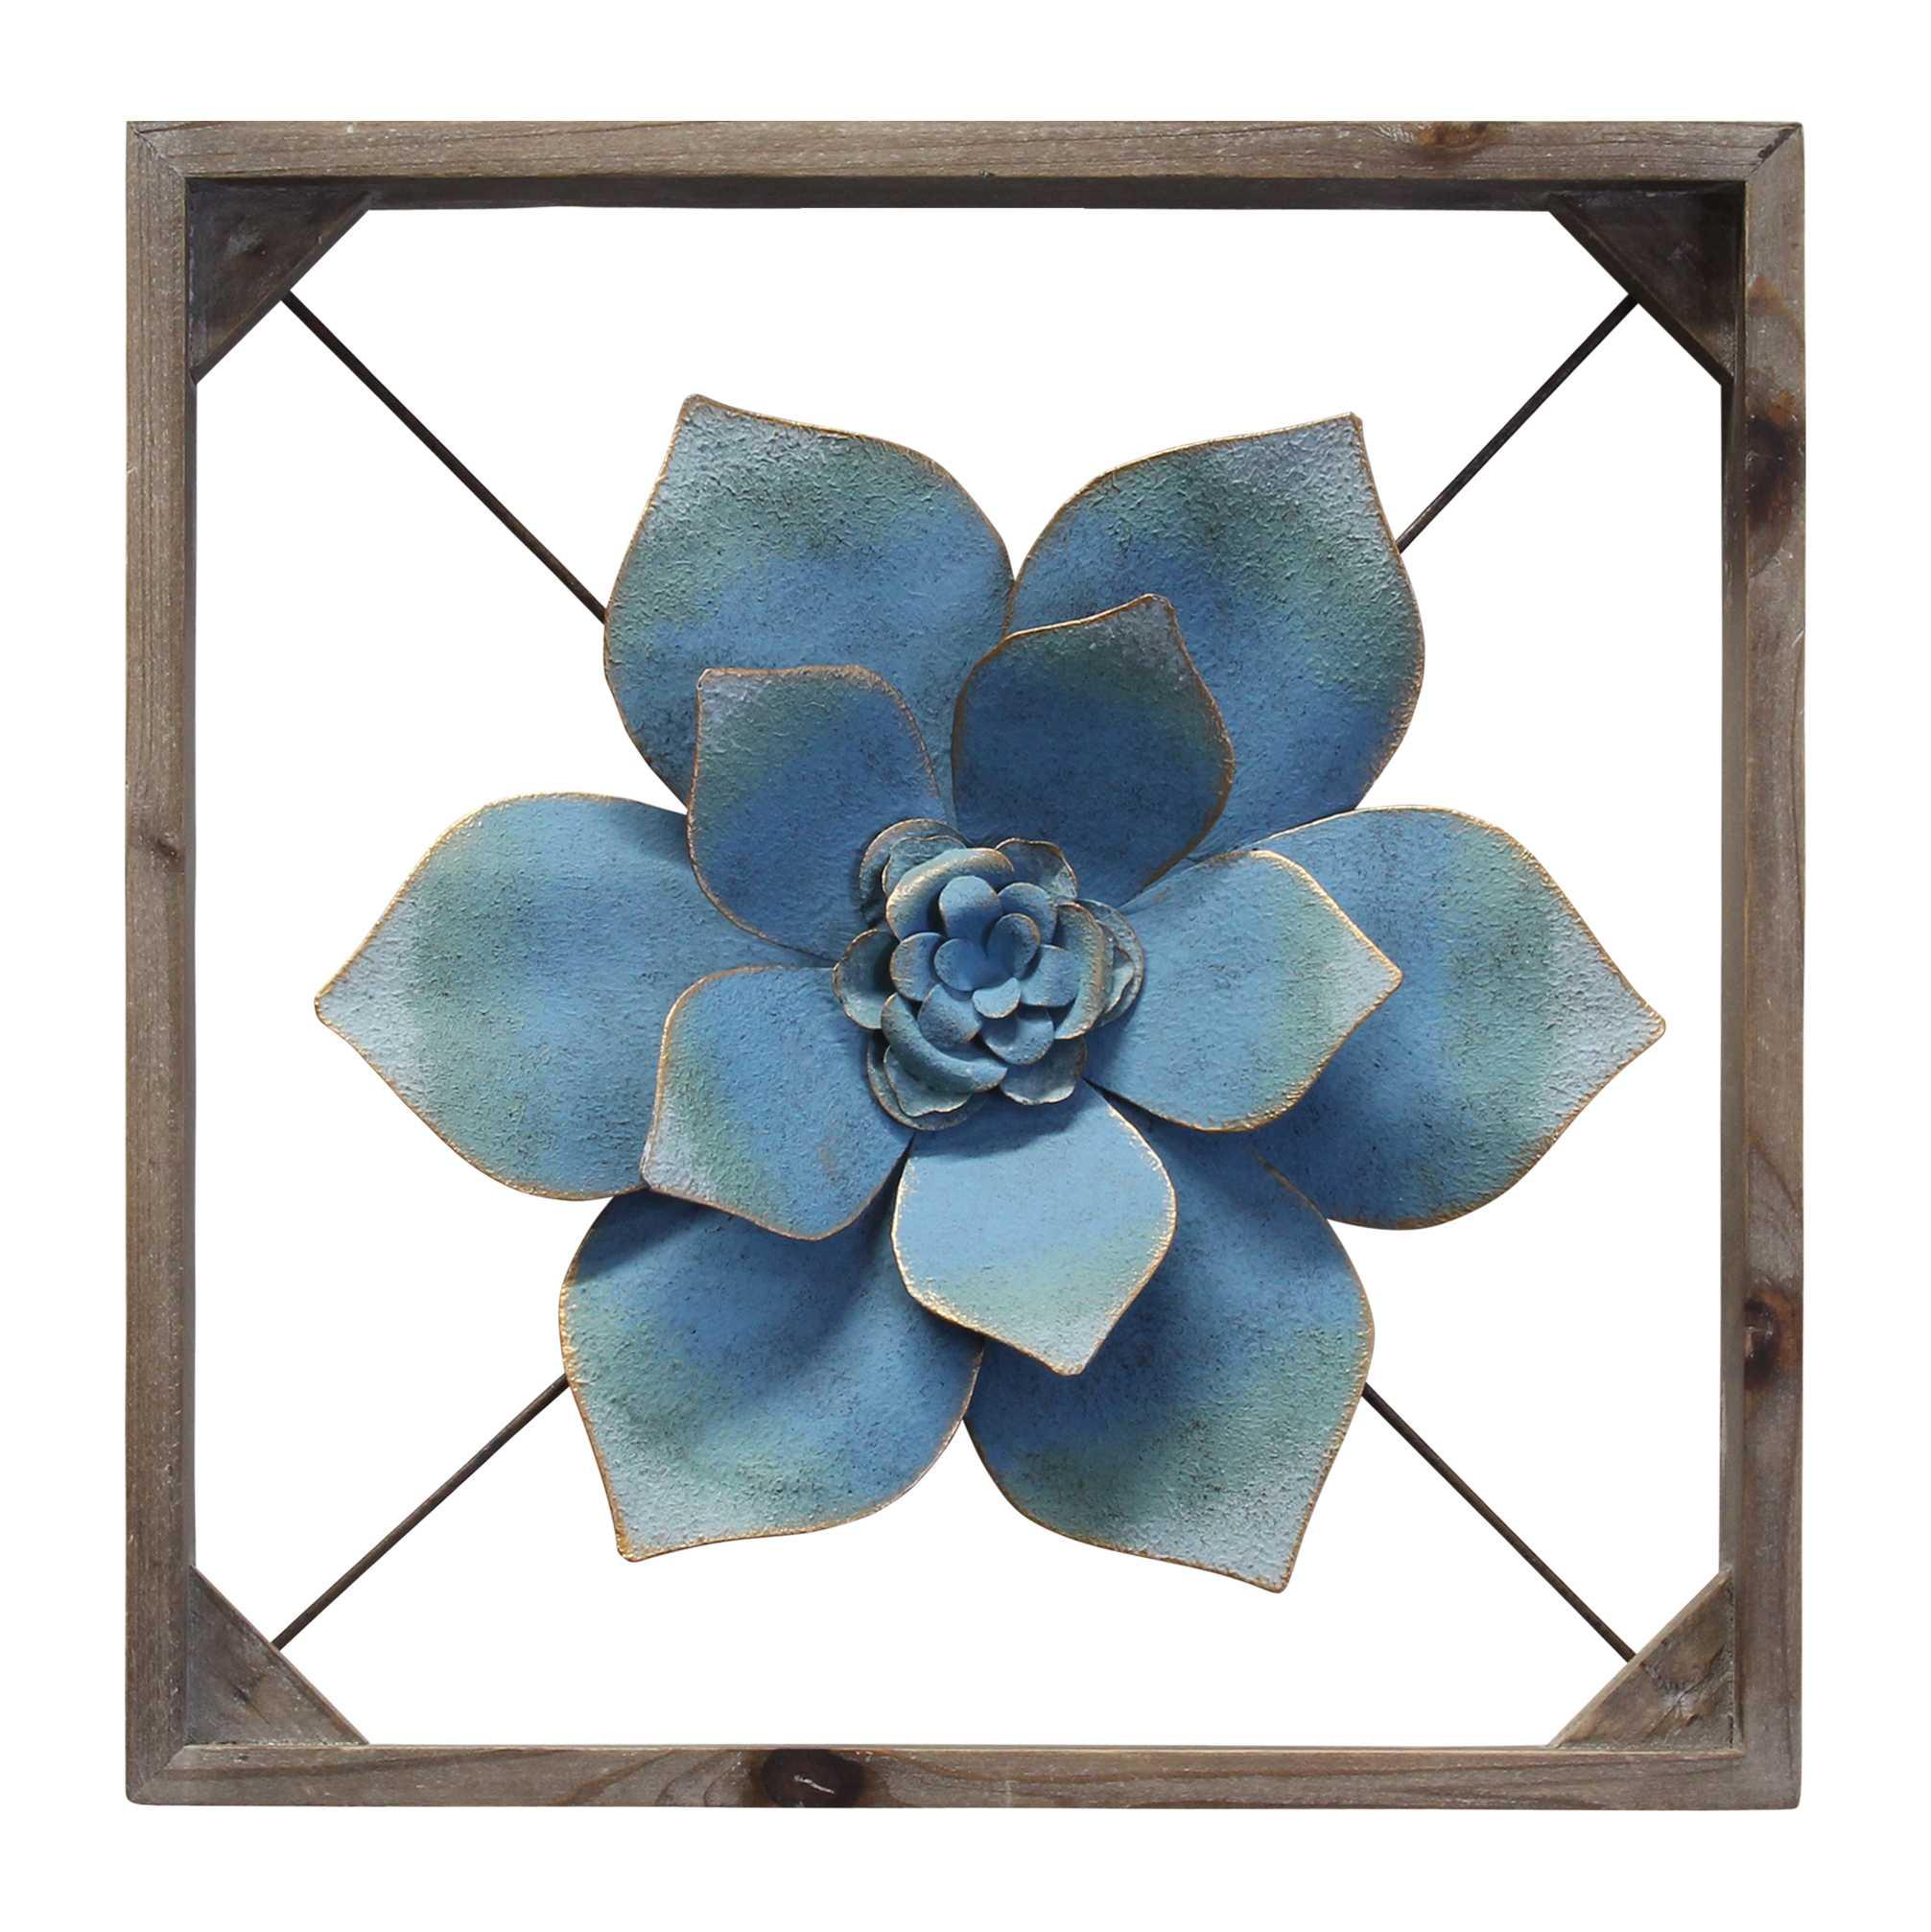 Sophisticated Metal & Wood Framed Wall Flower